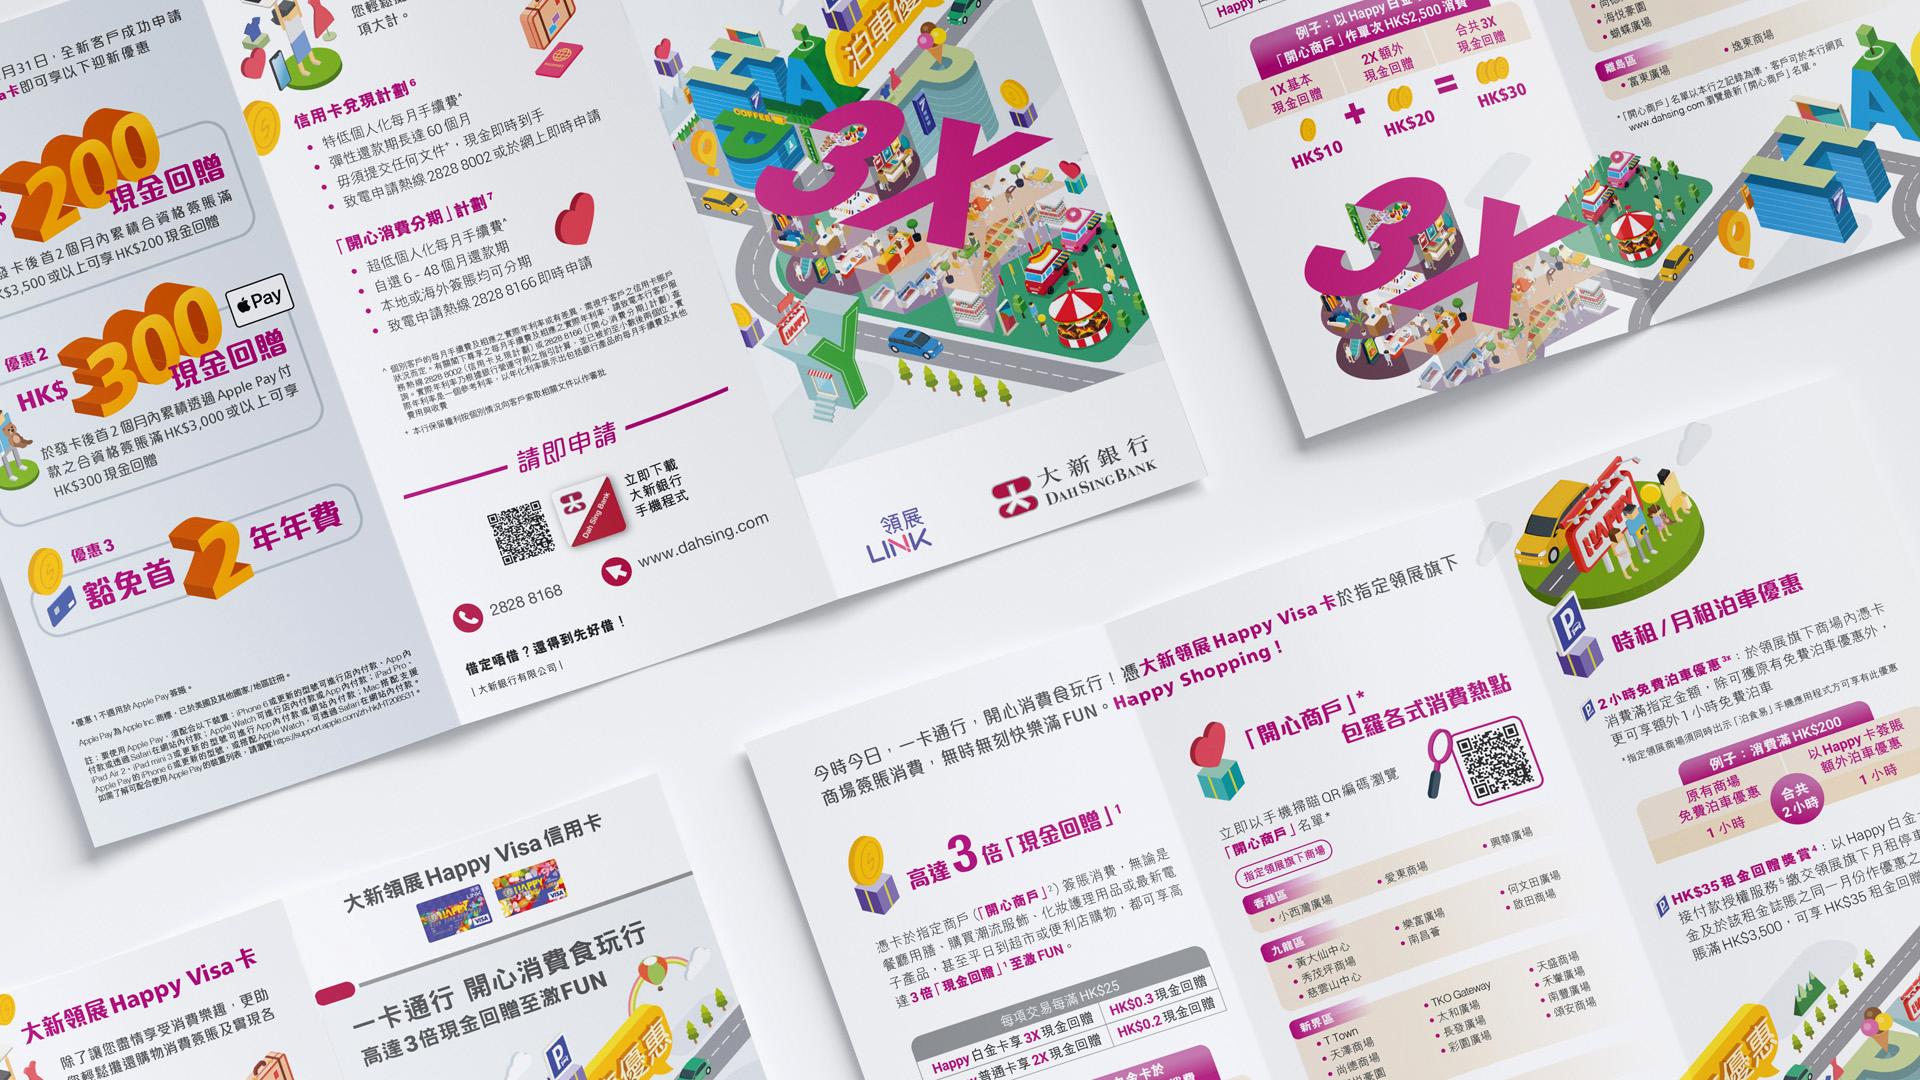 Dah Sing Bank Link's Happy Visa Card